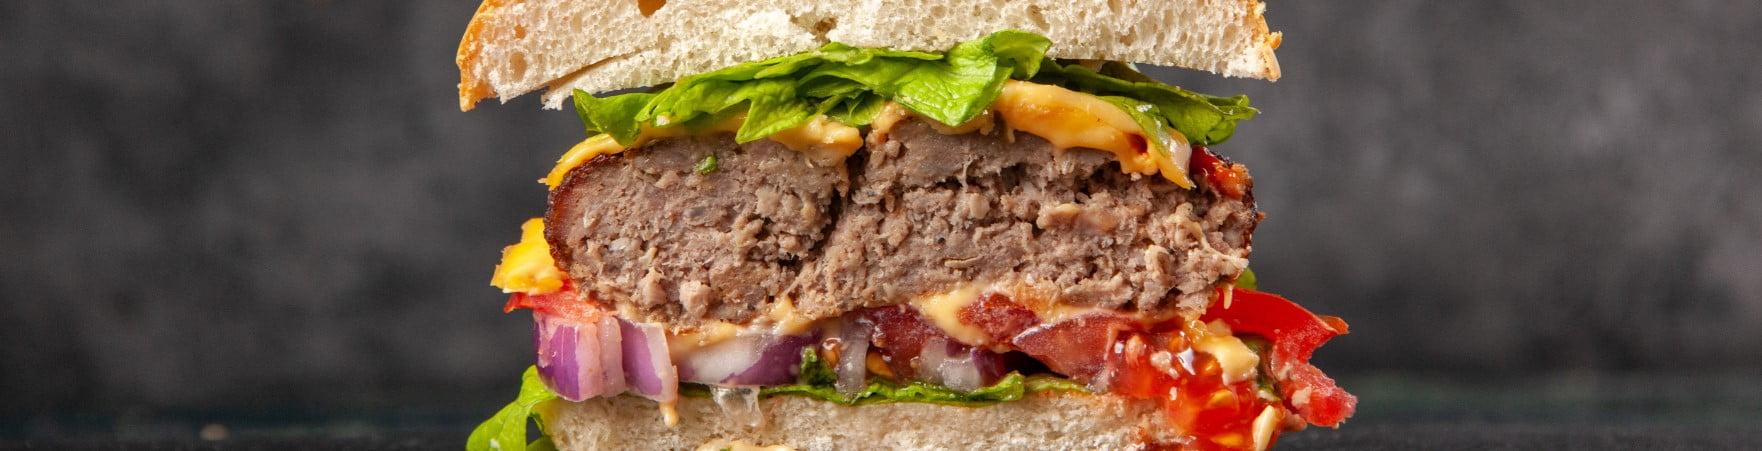 mięso domowe burgery